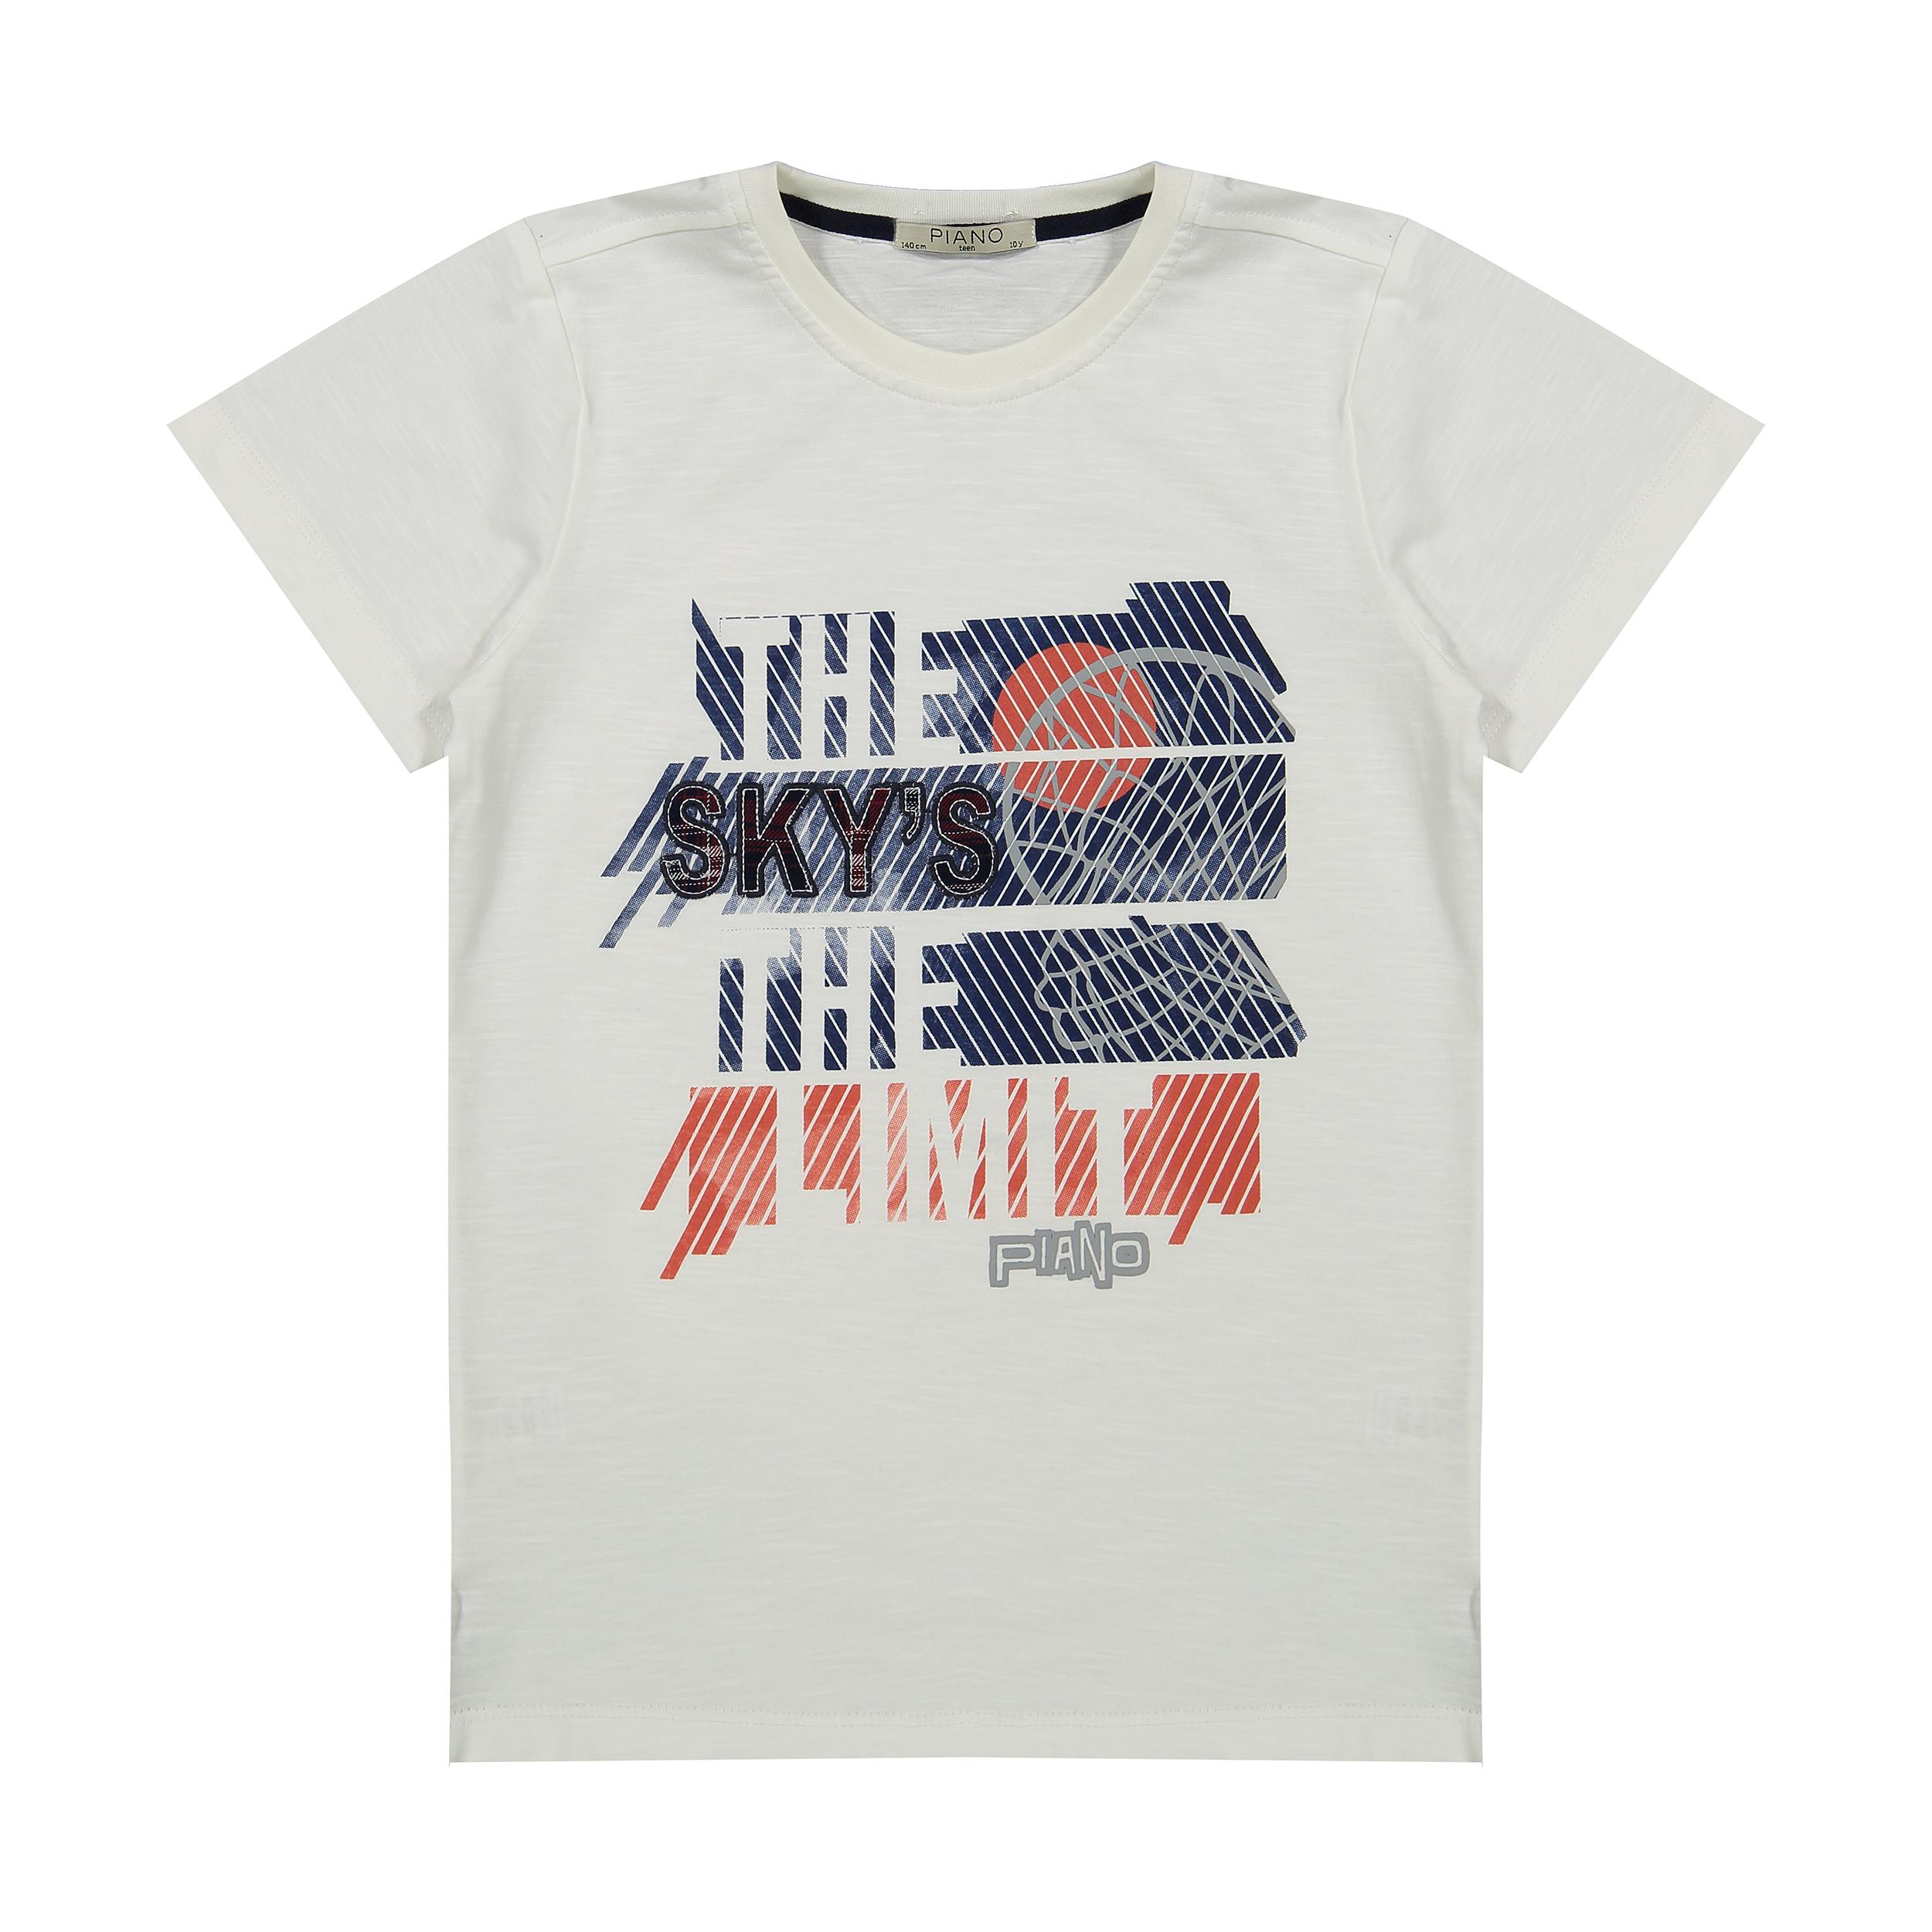 تی شرت پسرانه پیانو مدل 01534-1